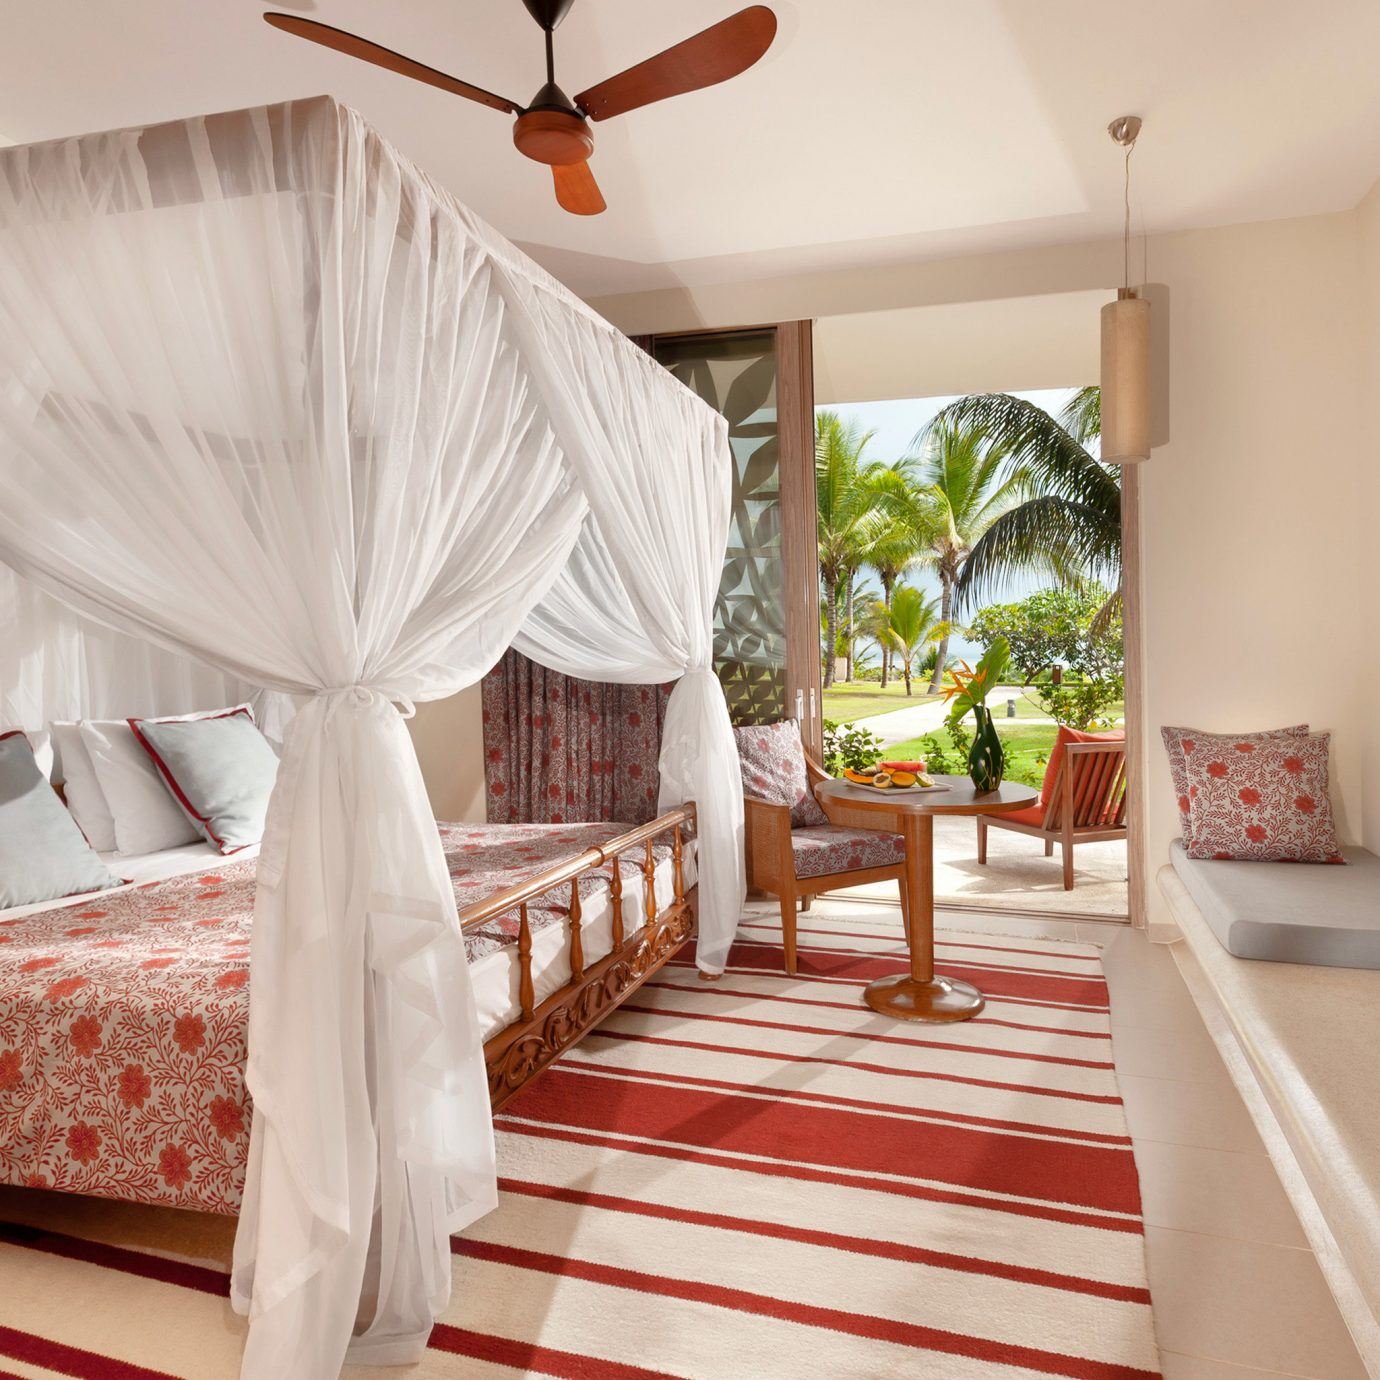 Bedroom Honeymoon Luxury Romantic Scenic views property Suite cottage Villa living room